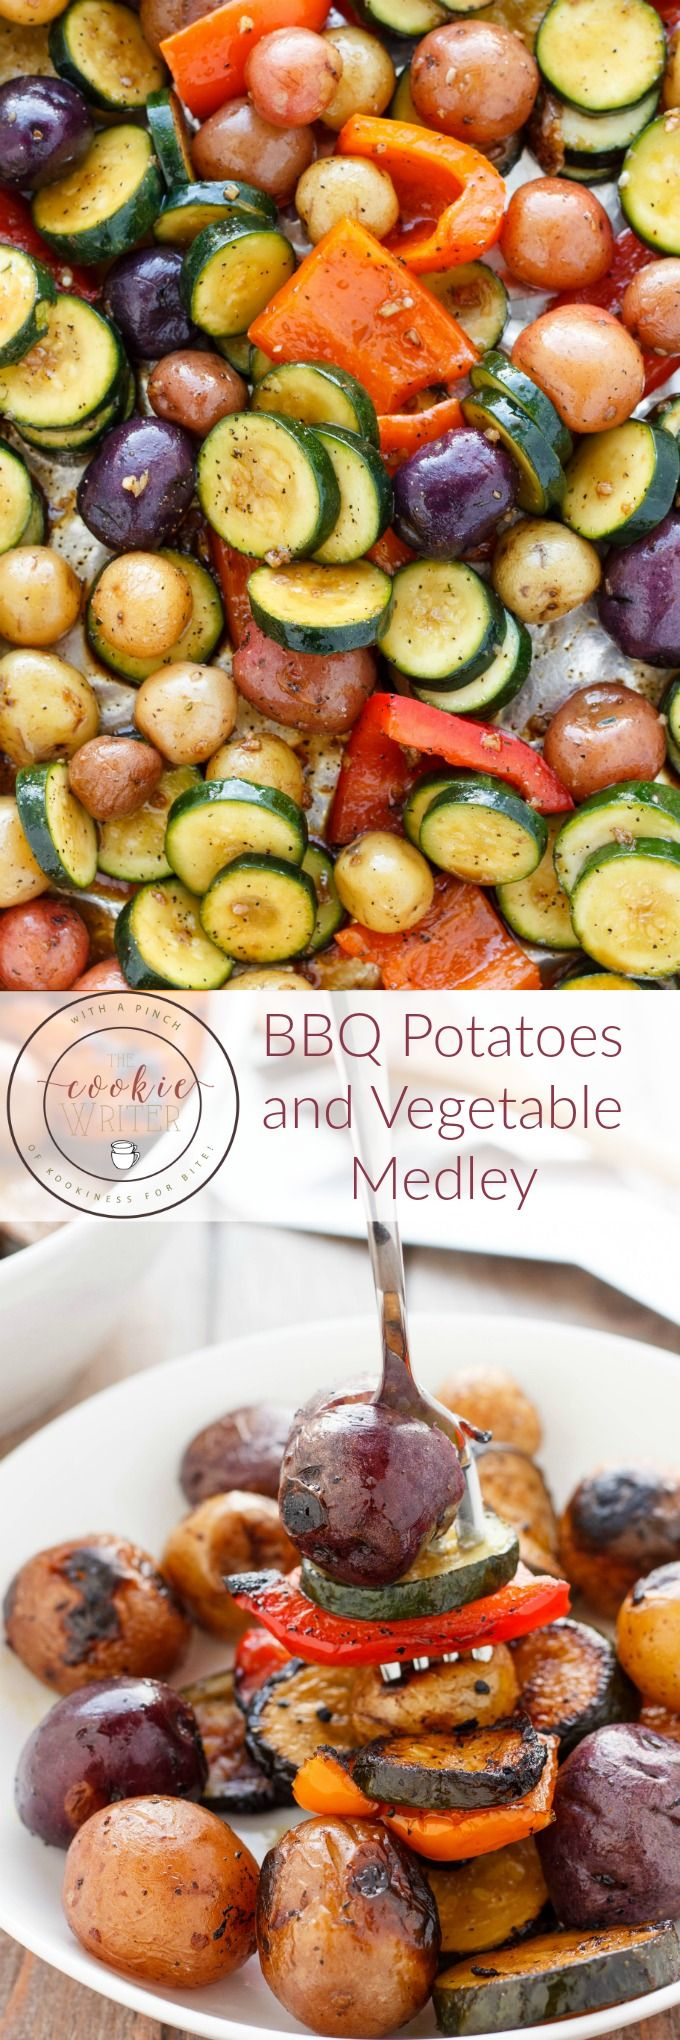 BBQ Potatoes and Vegetable Medley | #vegan #vegetarian #glutenfree #healthy #BBQ | http://thecookiewriter.com